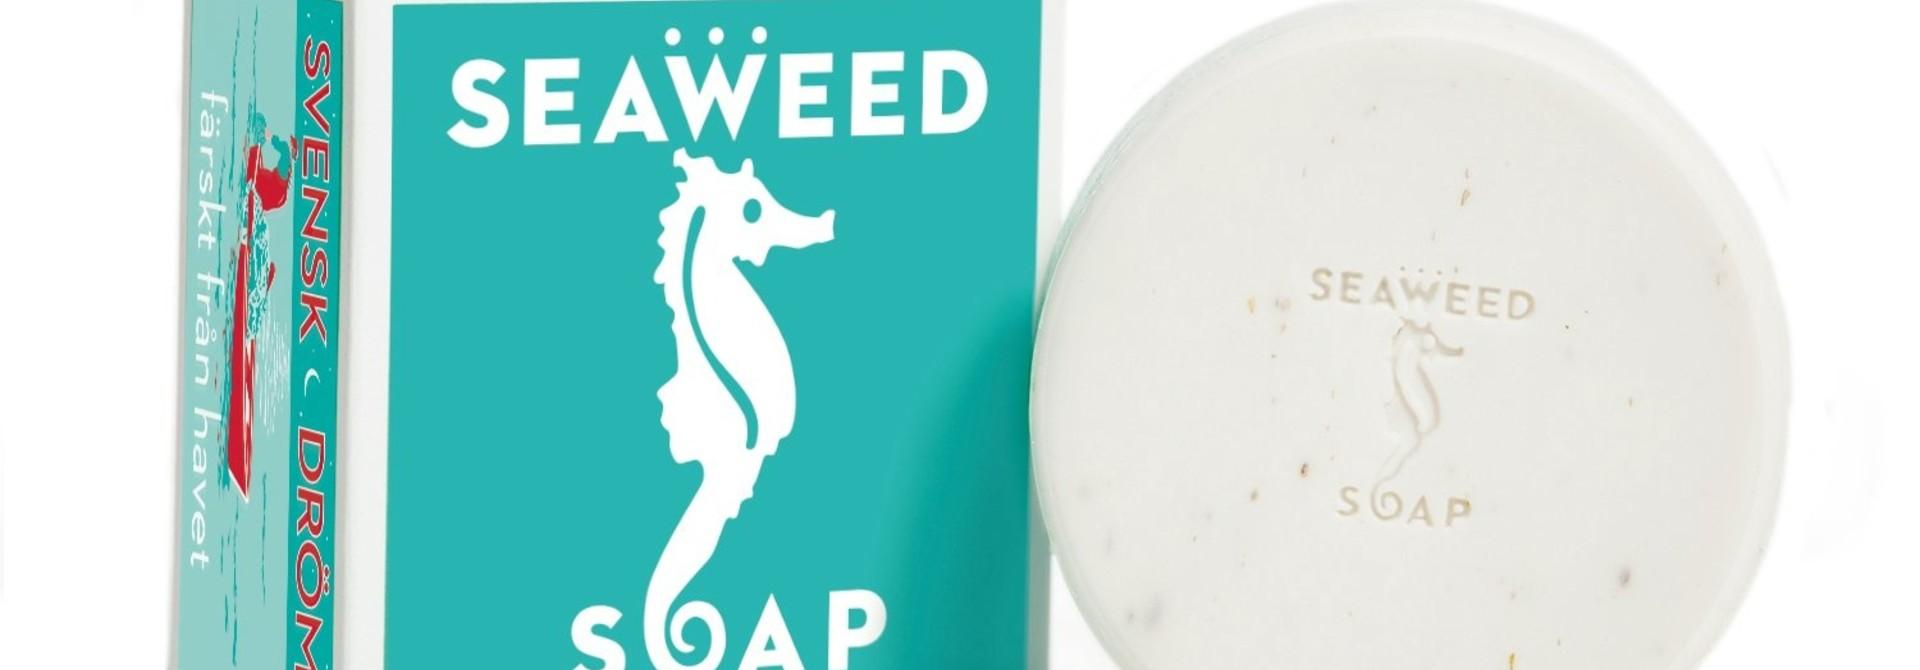 Swedish Dream - Seaweed Soap